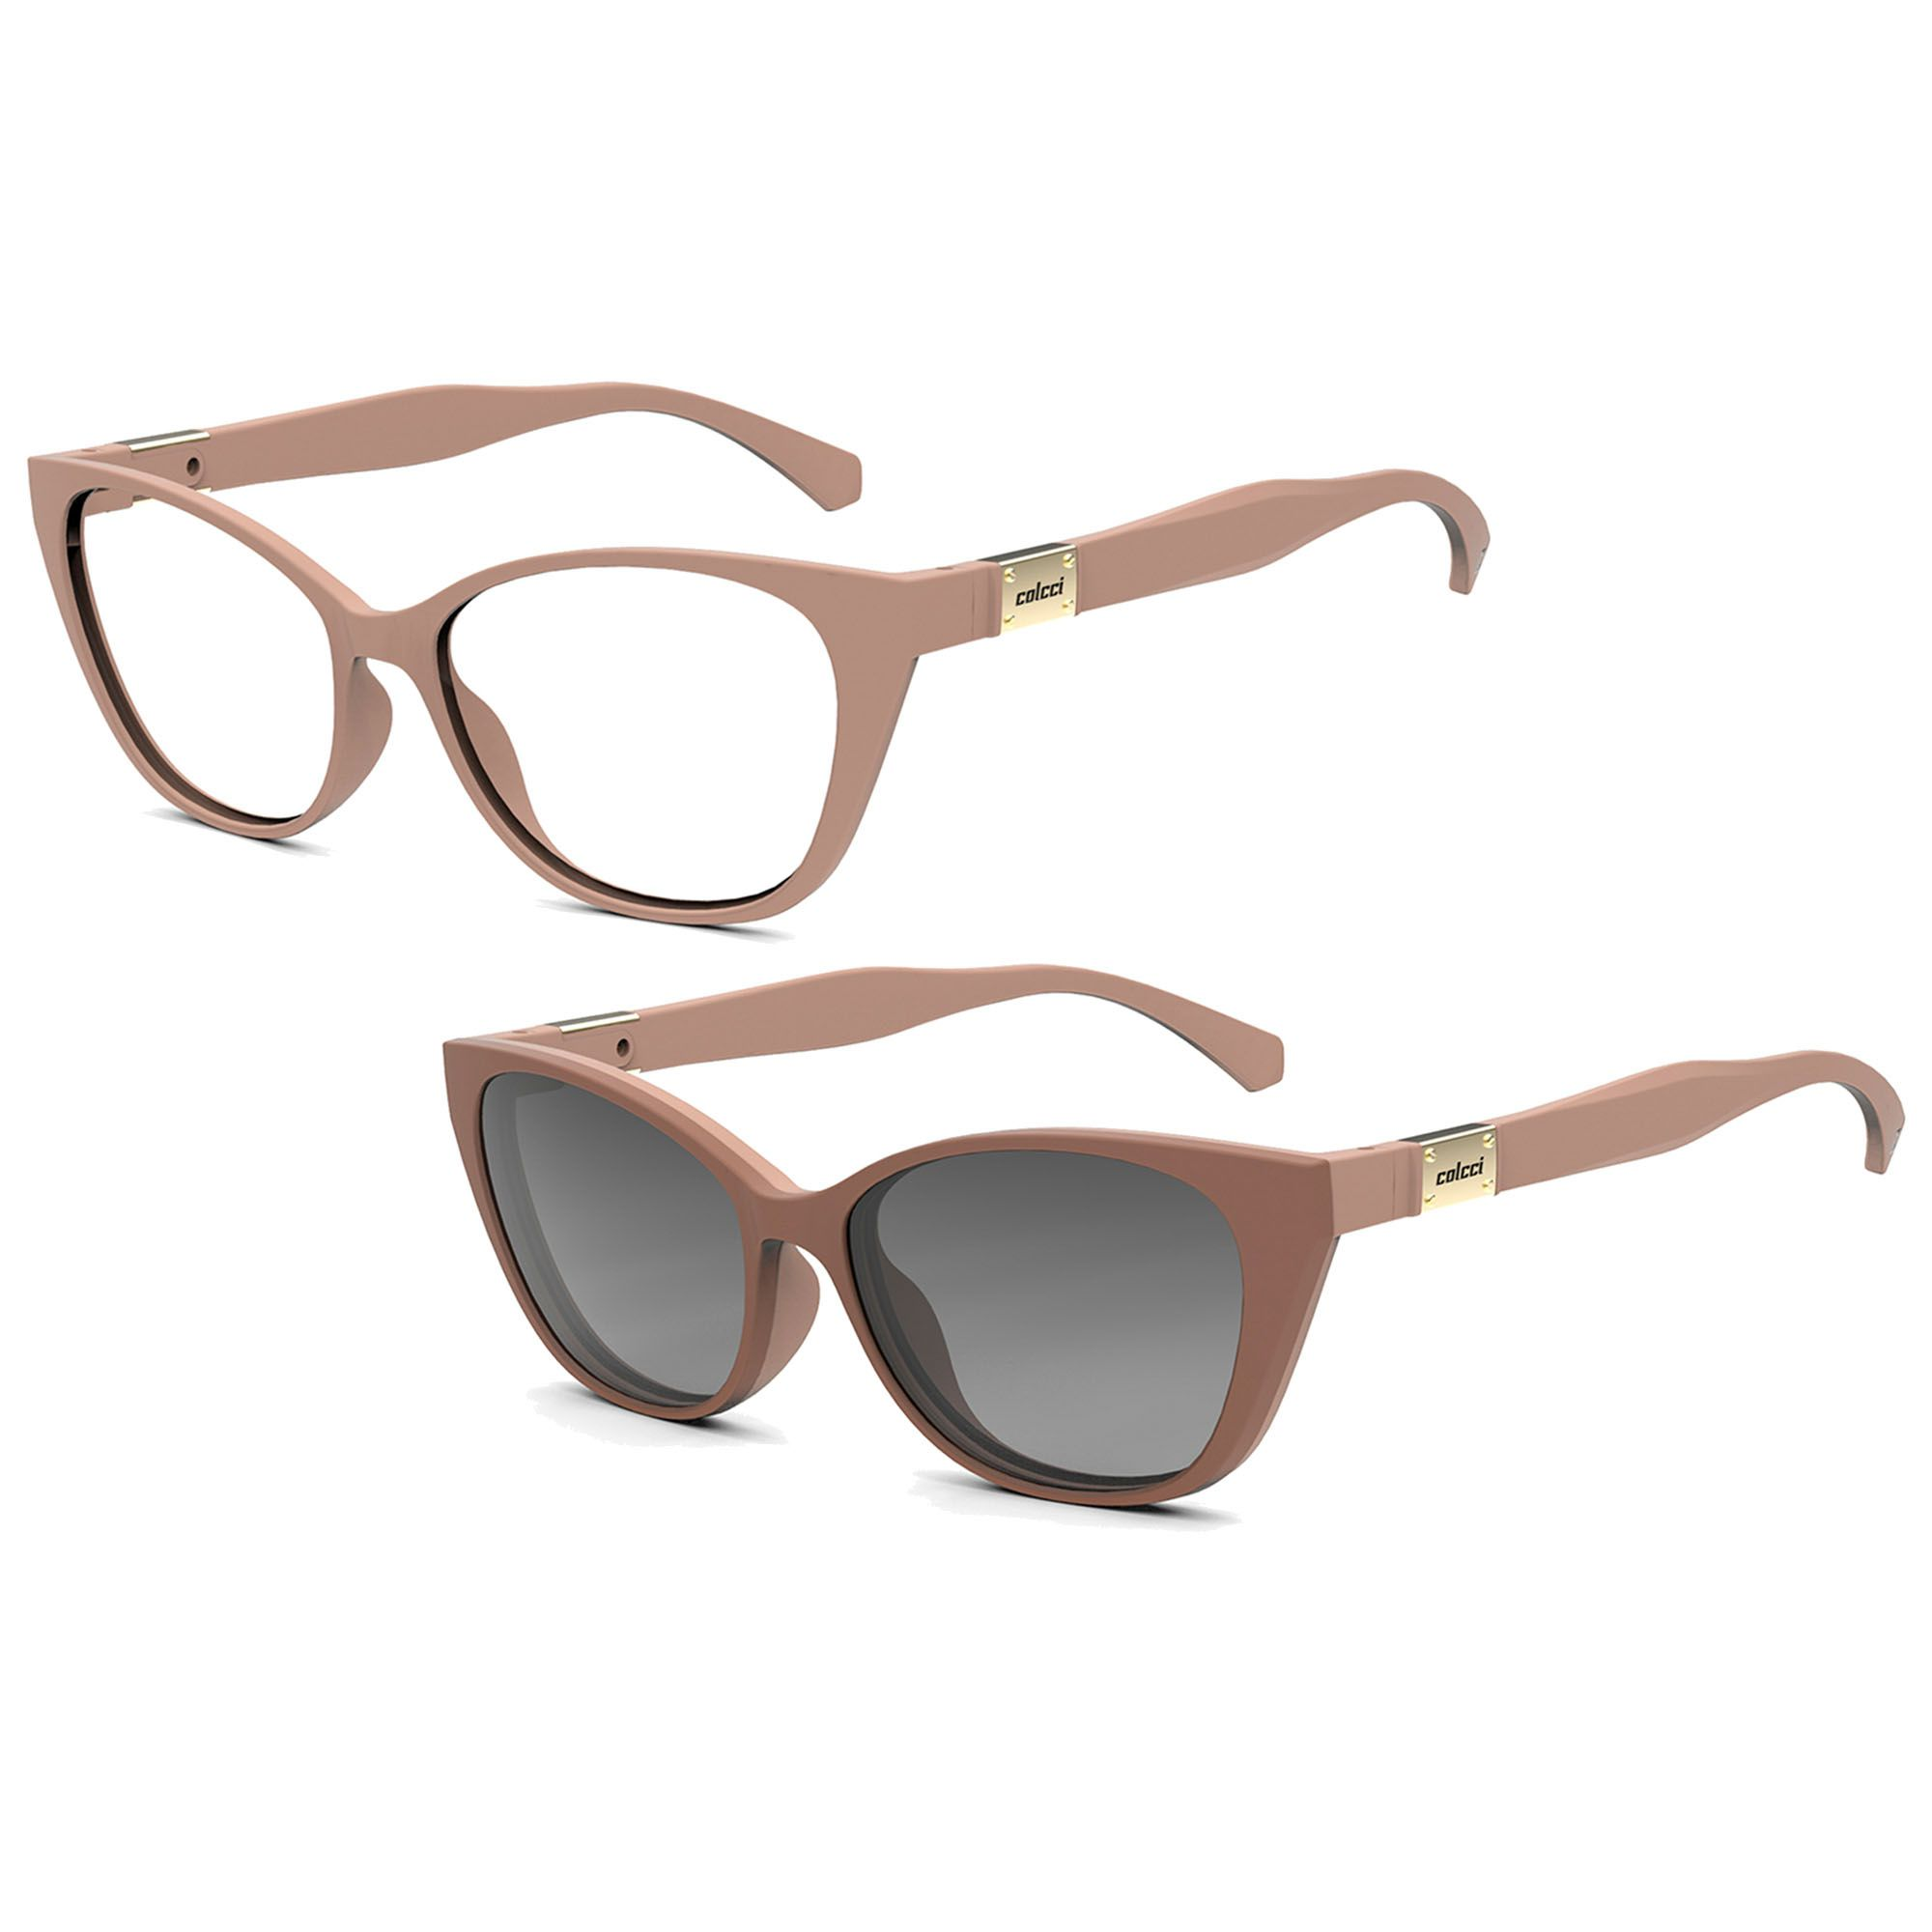 Óculos de Grau Feminino Colcci Bandy I C6122B2852 Clip On Solar Polarizado